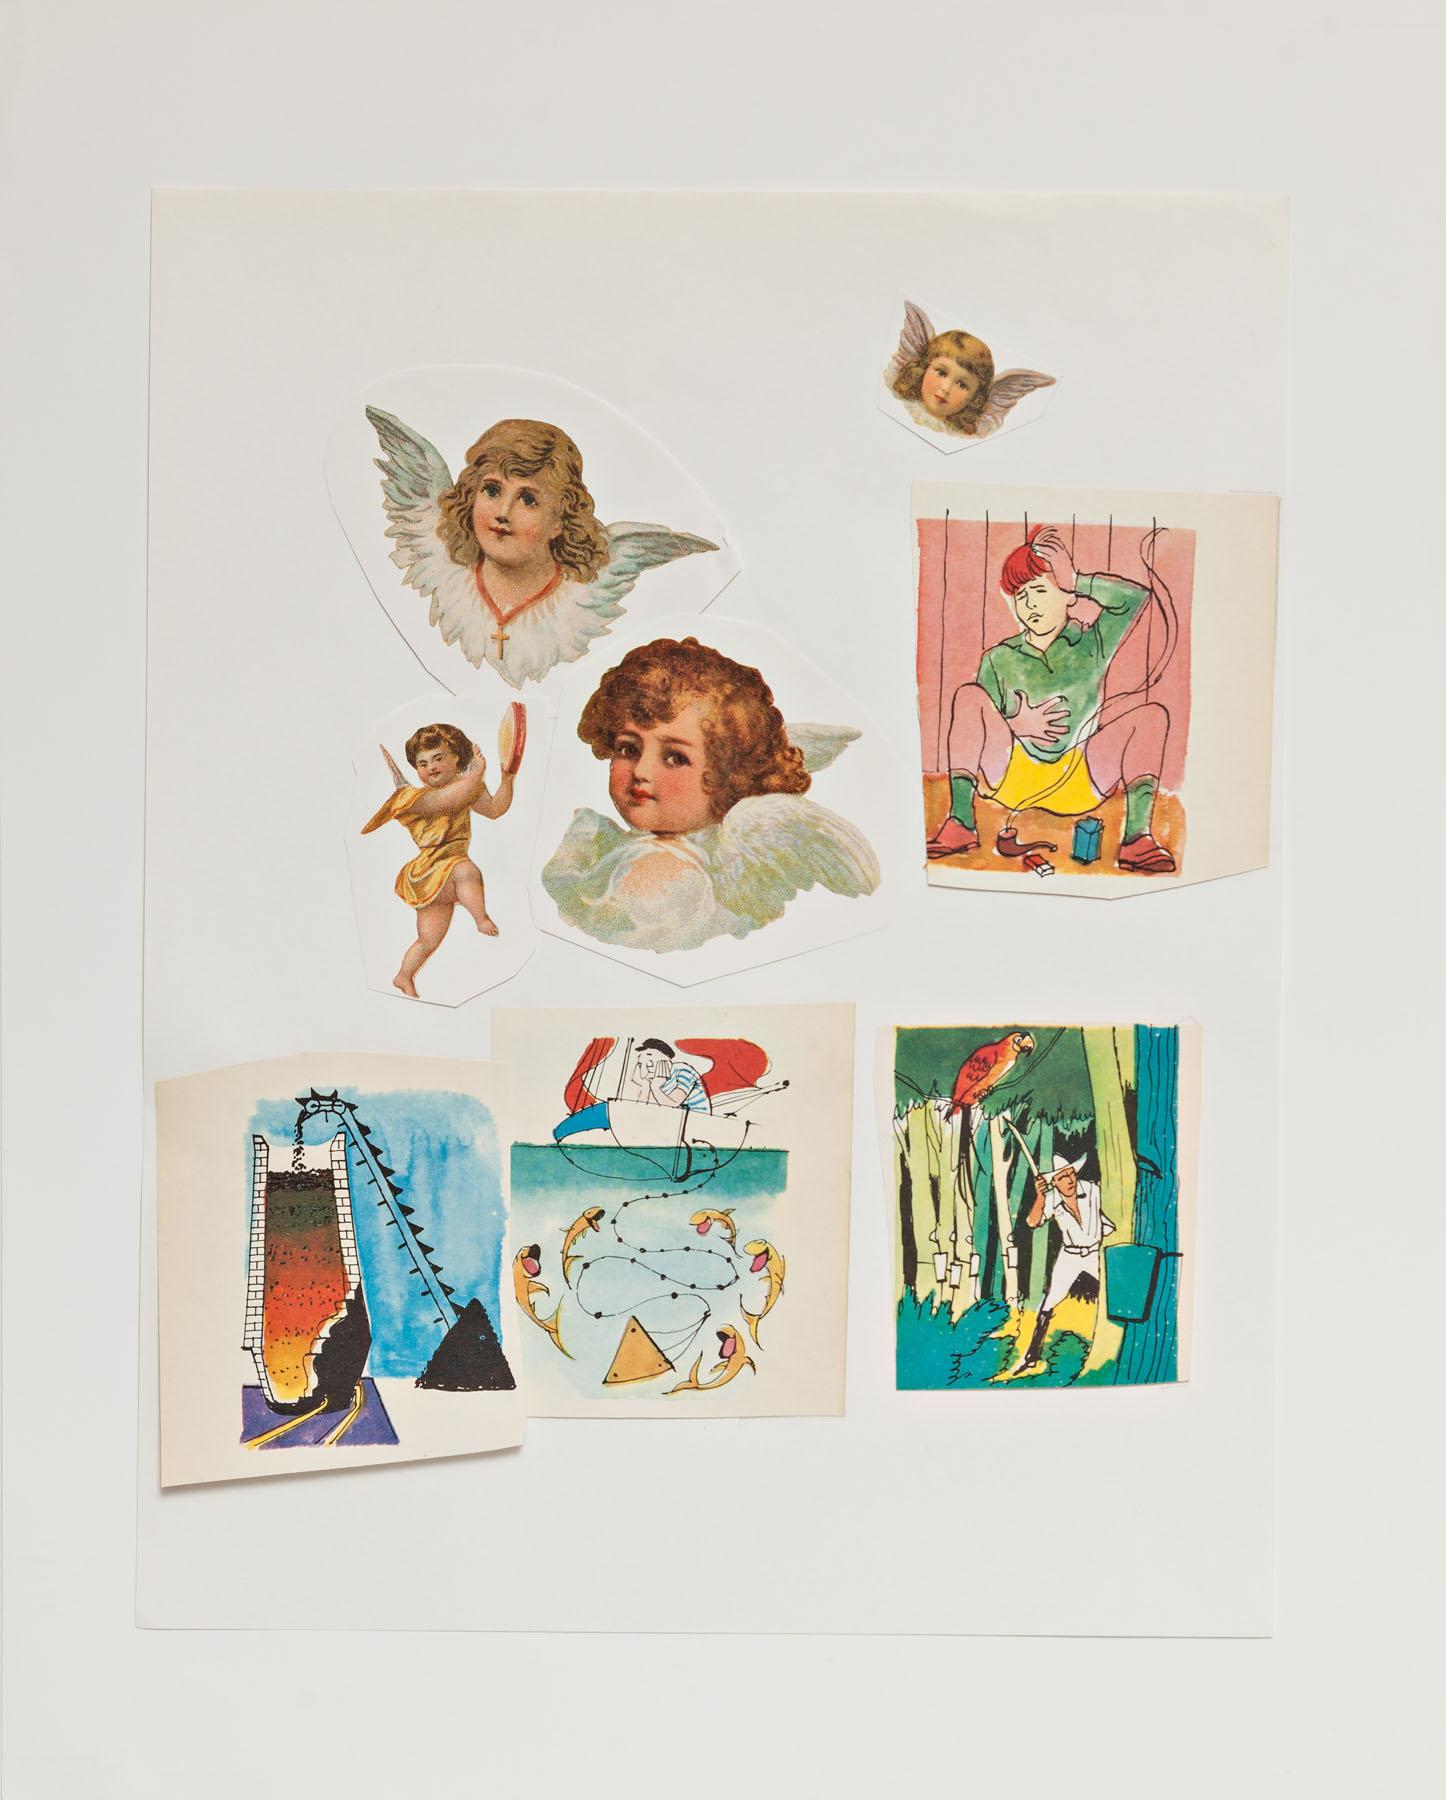 Serie Cuarentena, papel collage, 35 cm x 28 cm, 2020